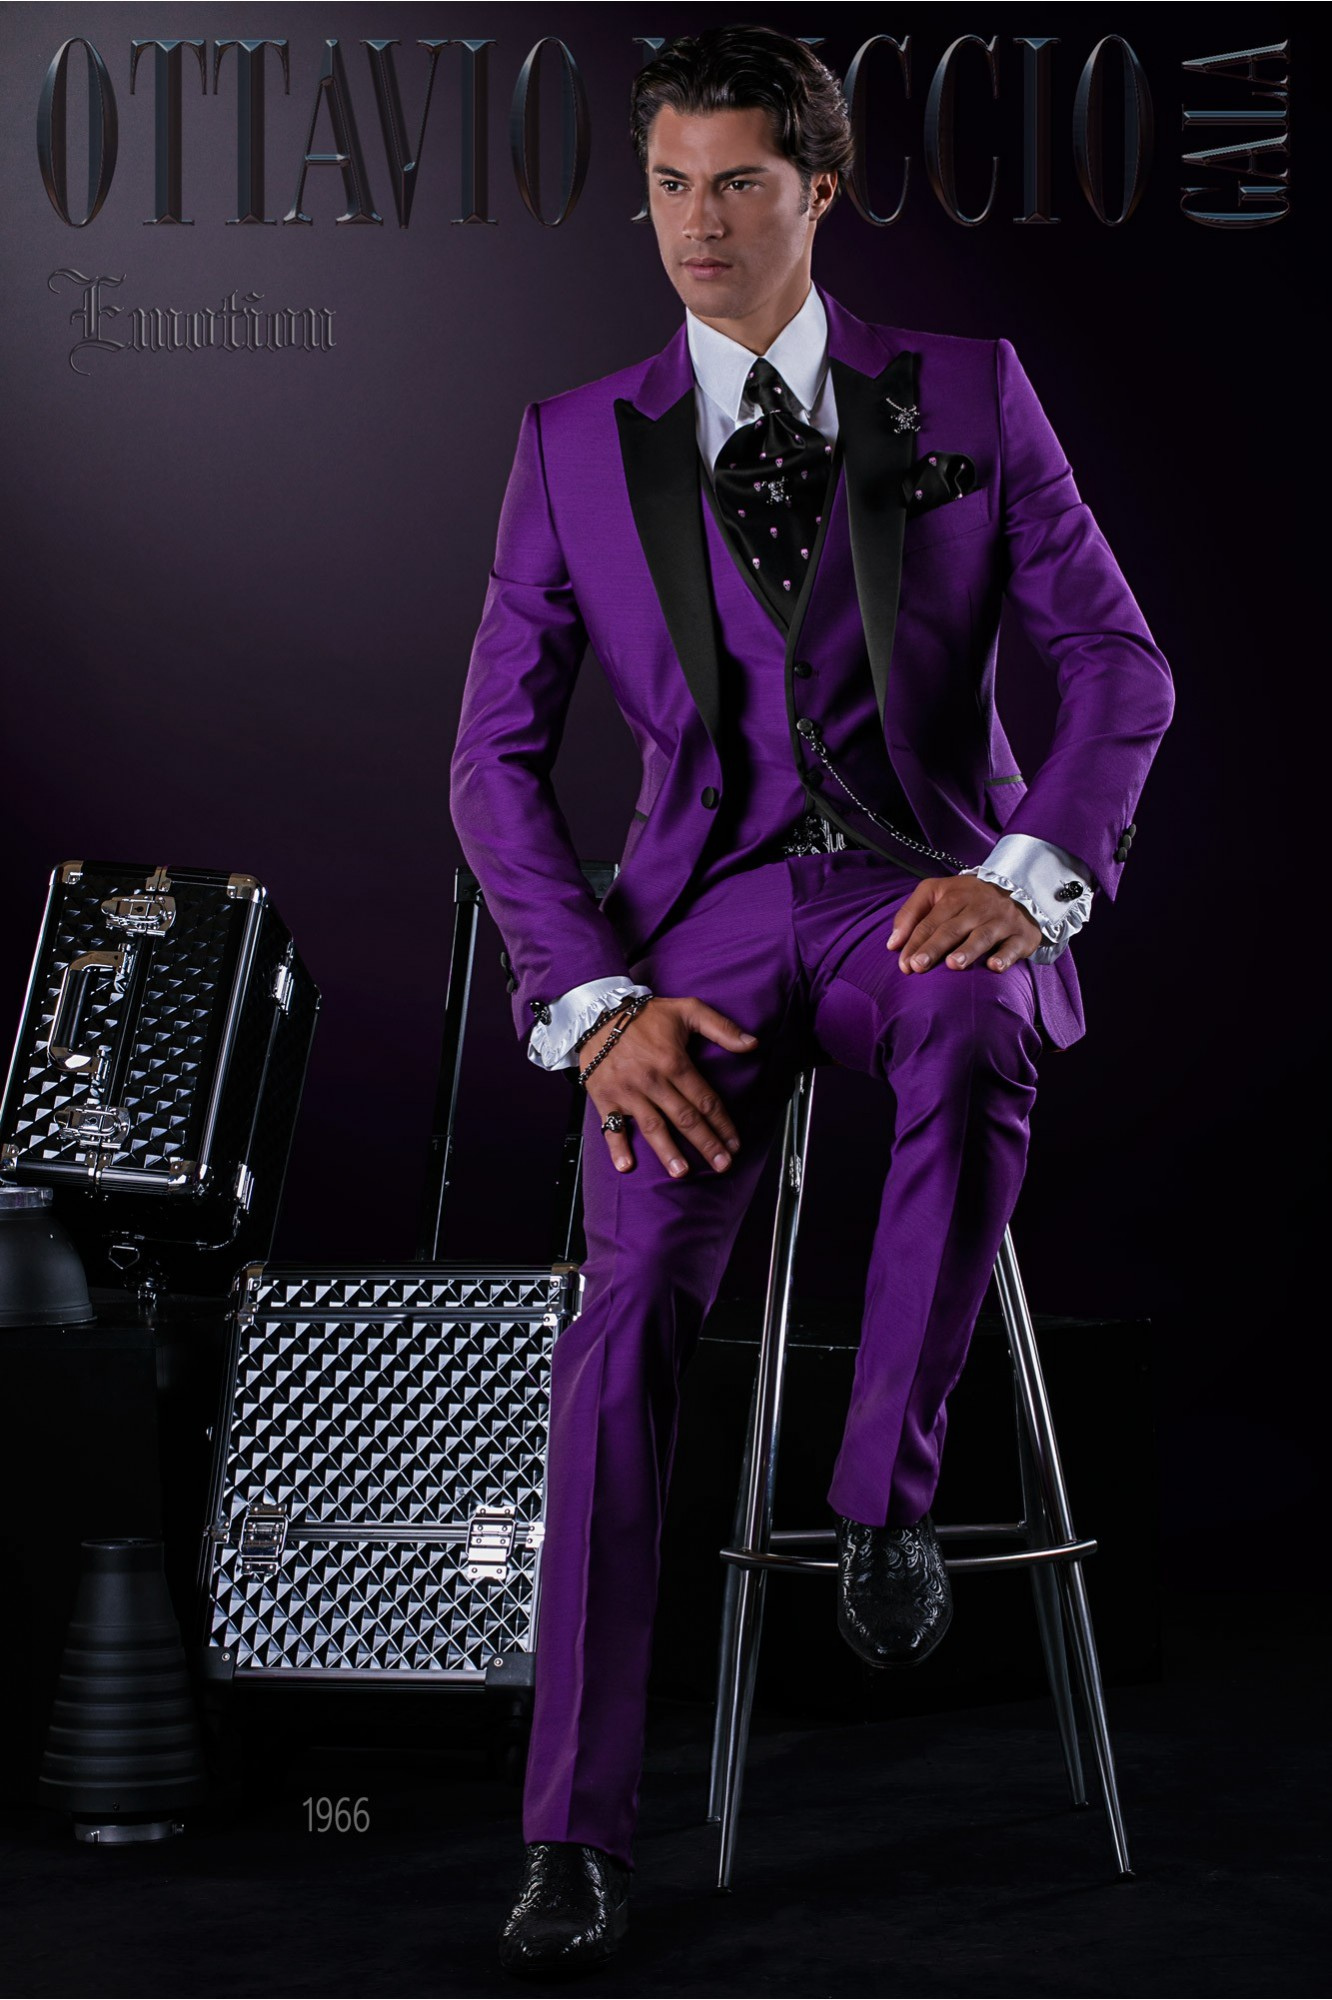 Fashion Italian bespoke purple suit with waistcoat